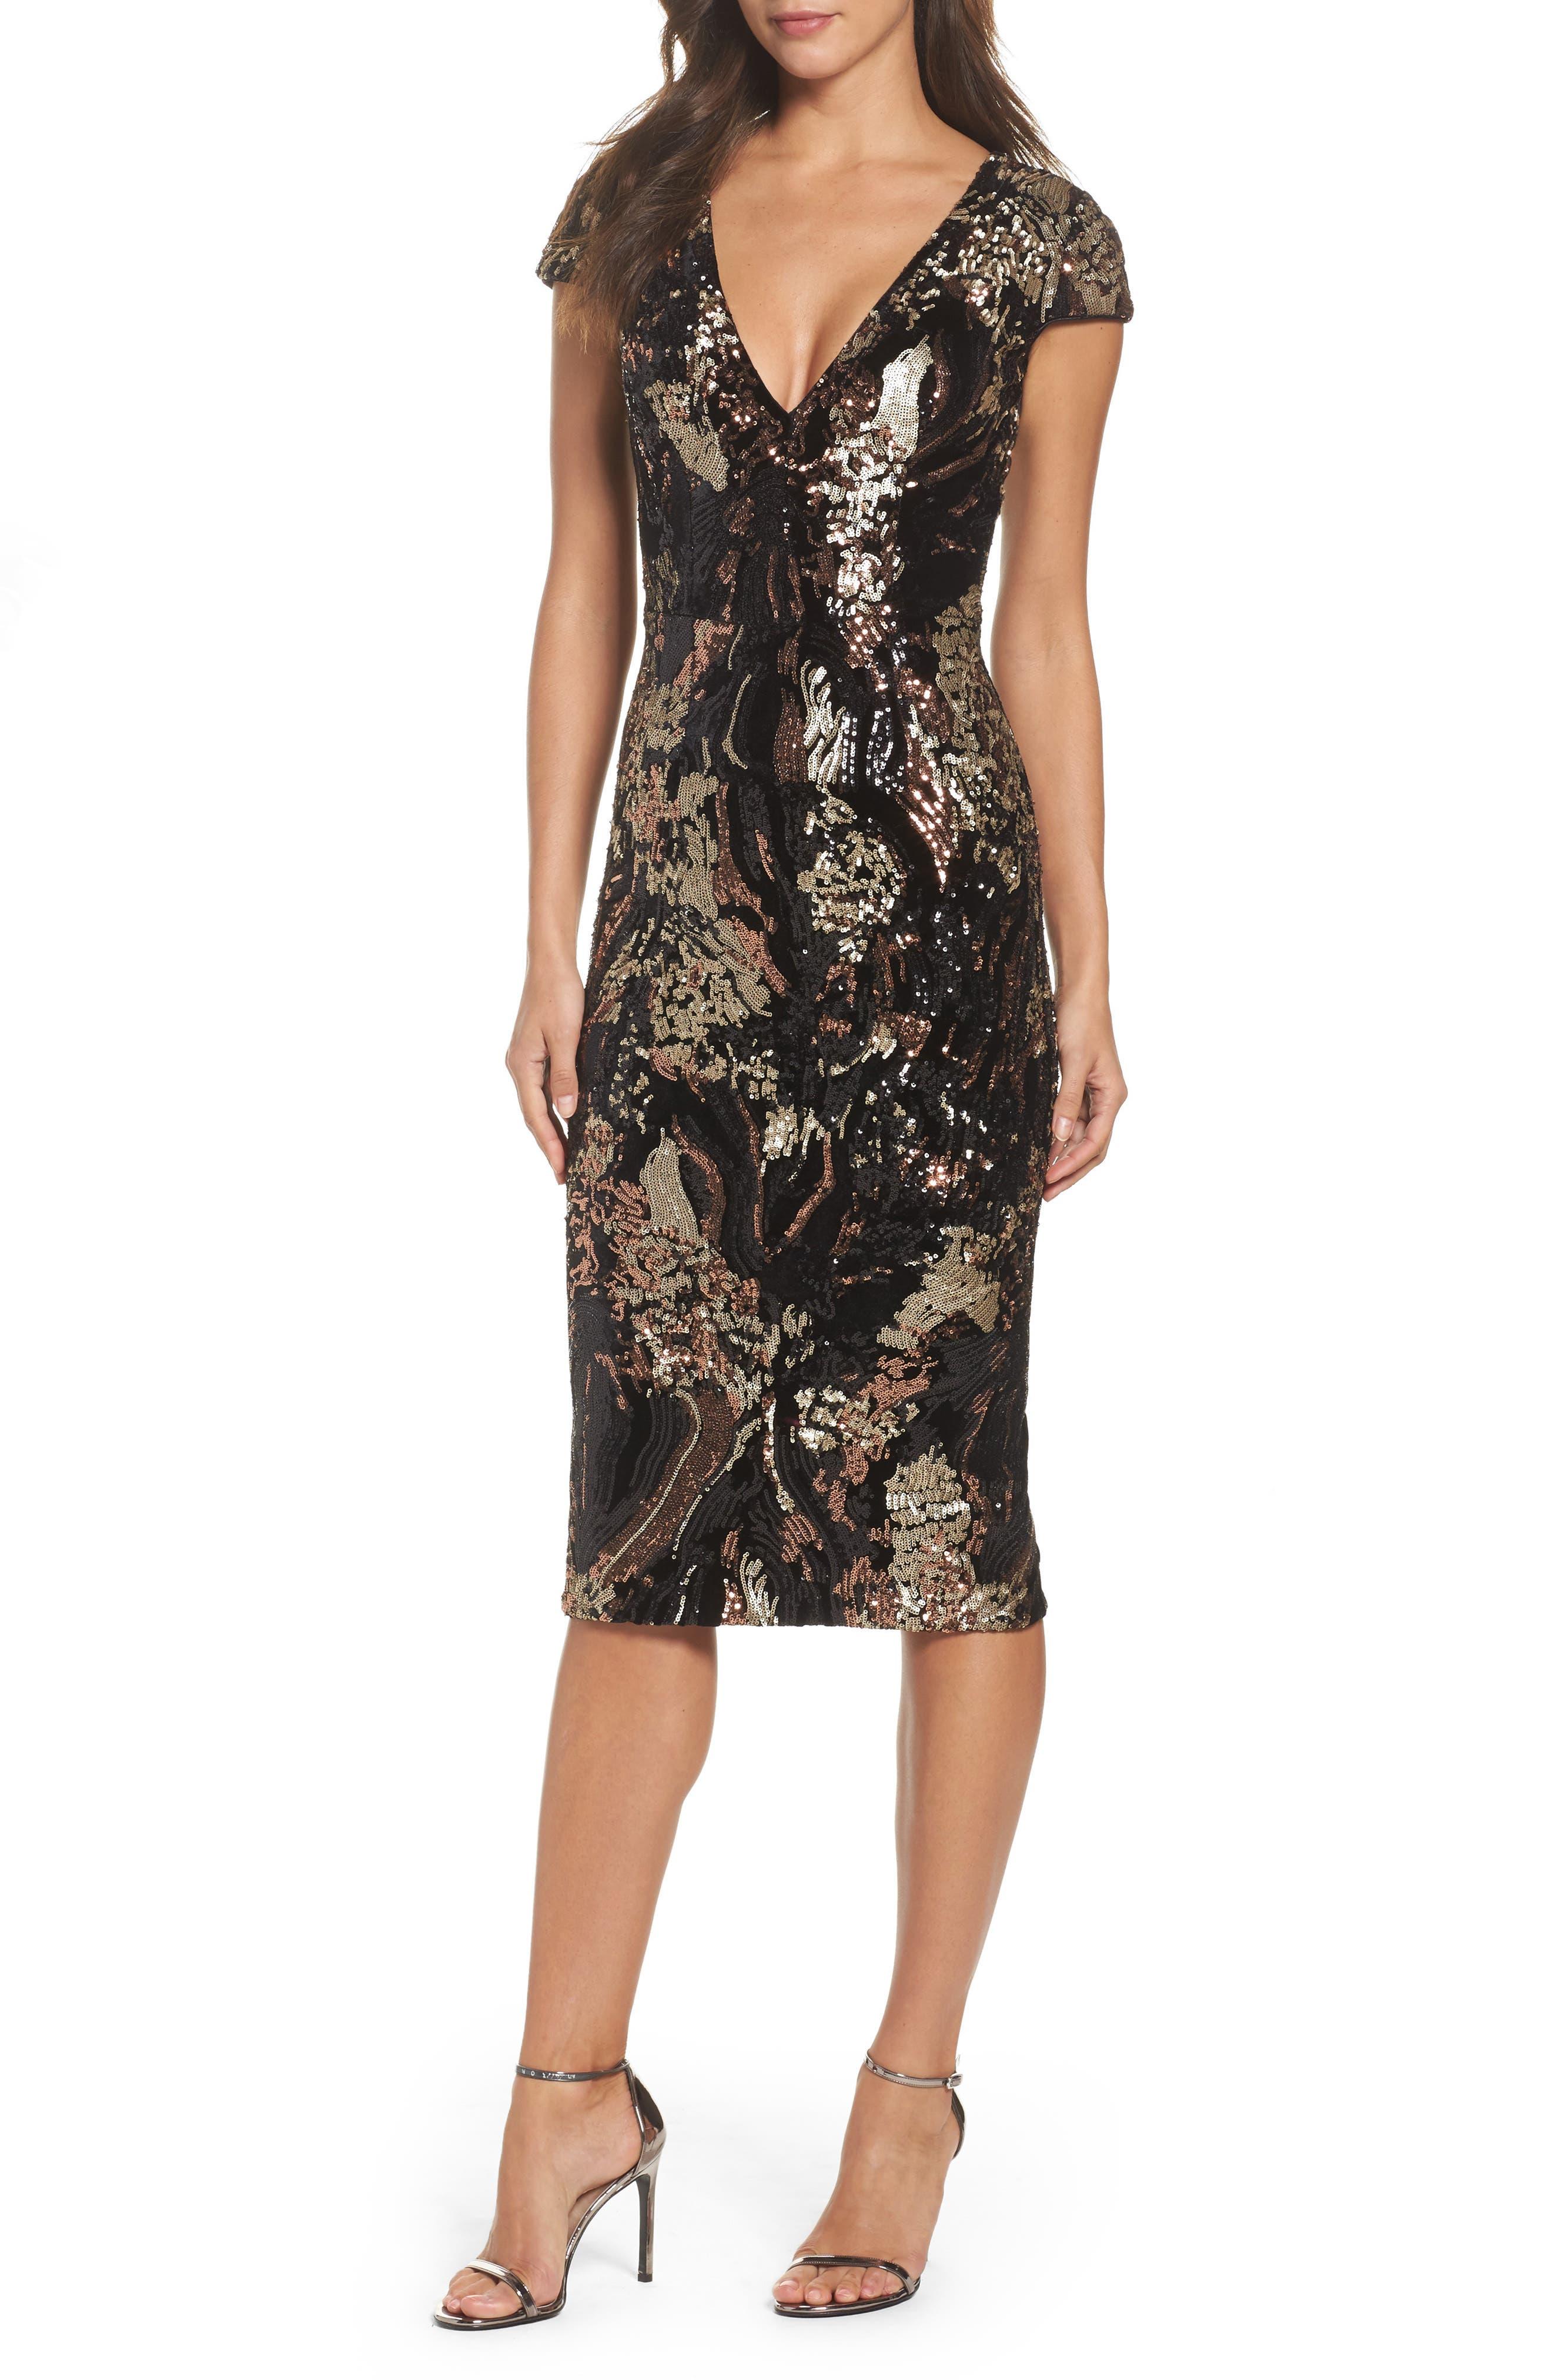 Main Image - Dress the Population Allison Sequin Velvet Body-Con Dress (Nordstrom Exclusive)